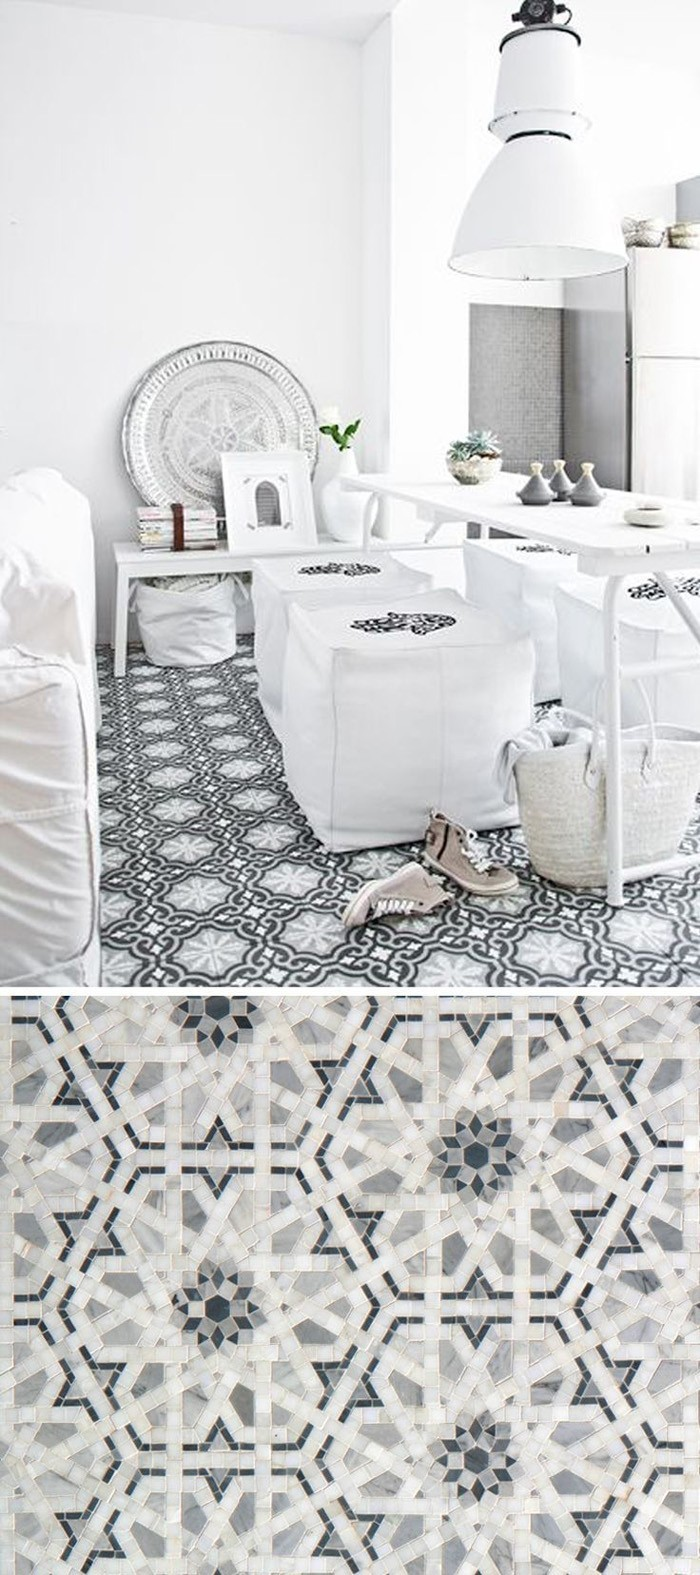 marokkanische fliesen zementfliesen interirdesign ideen wohnung design anders denken mosaik fliesen bodenbleag